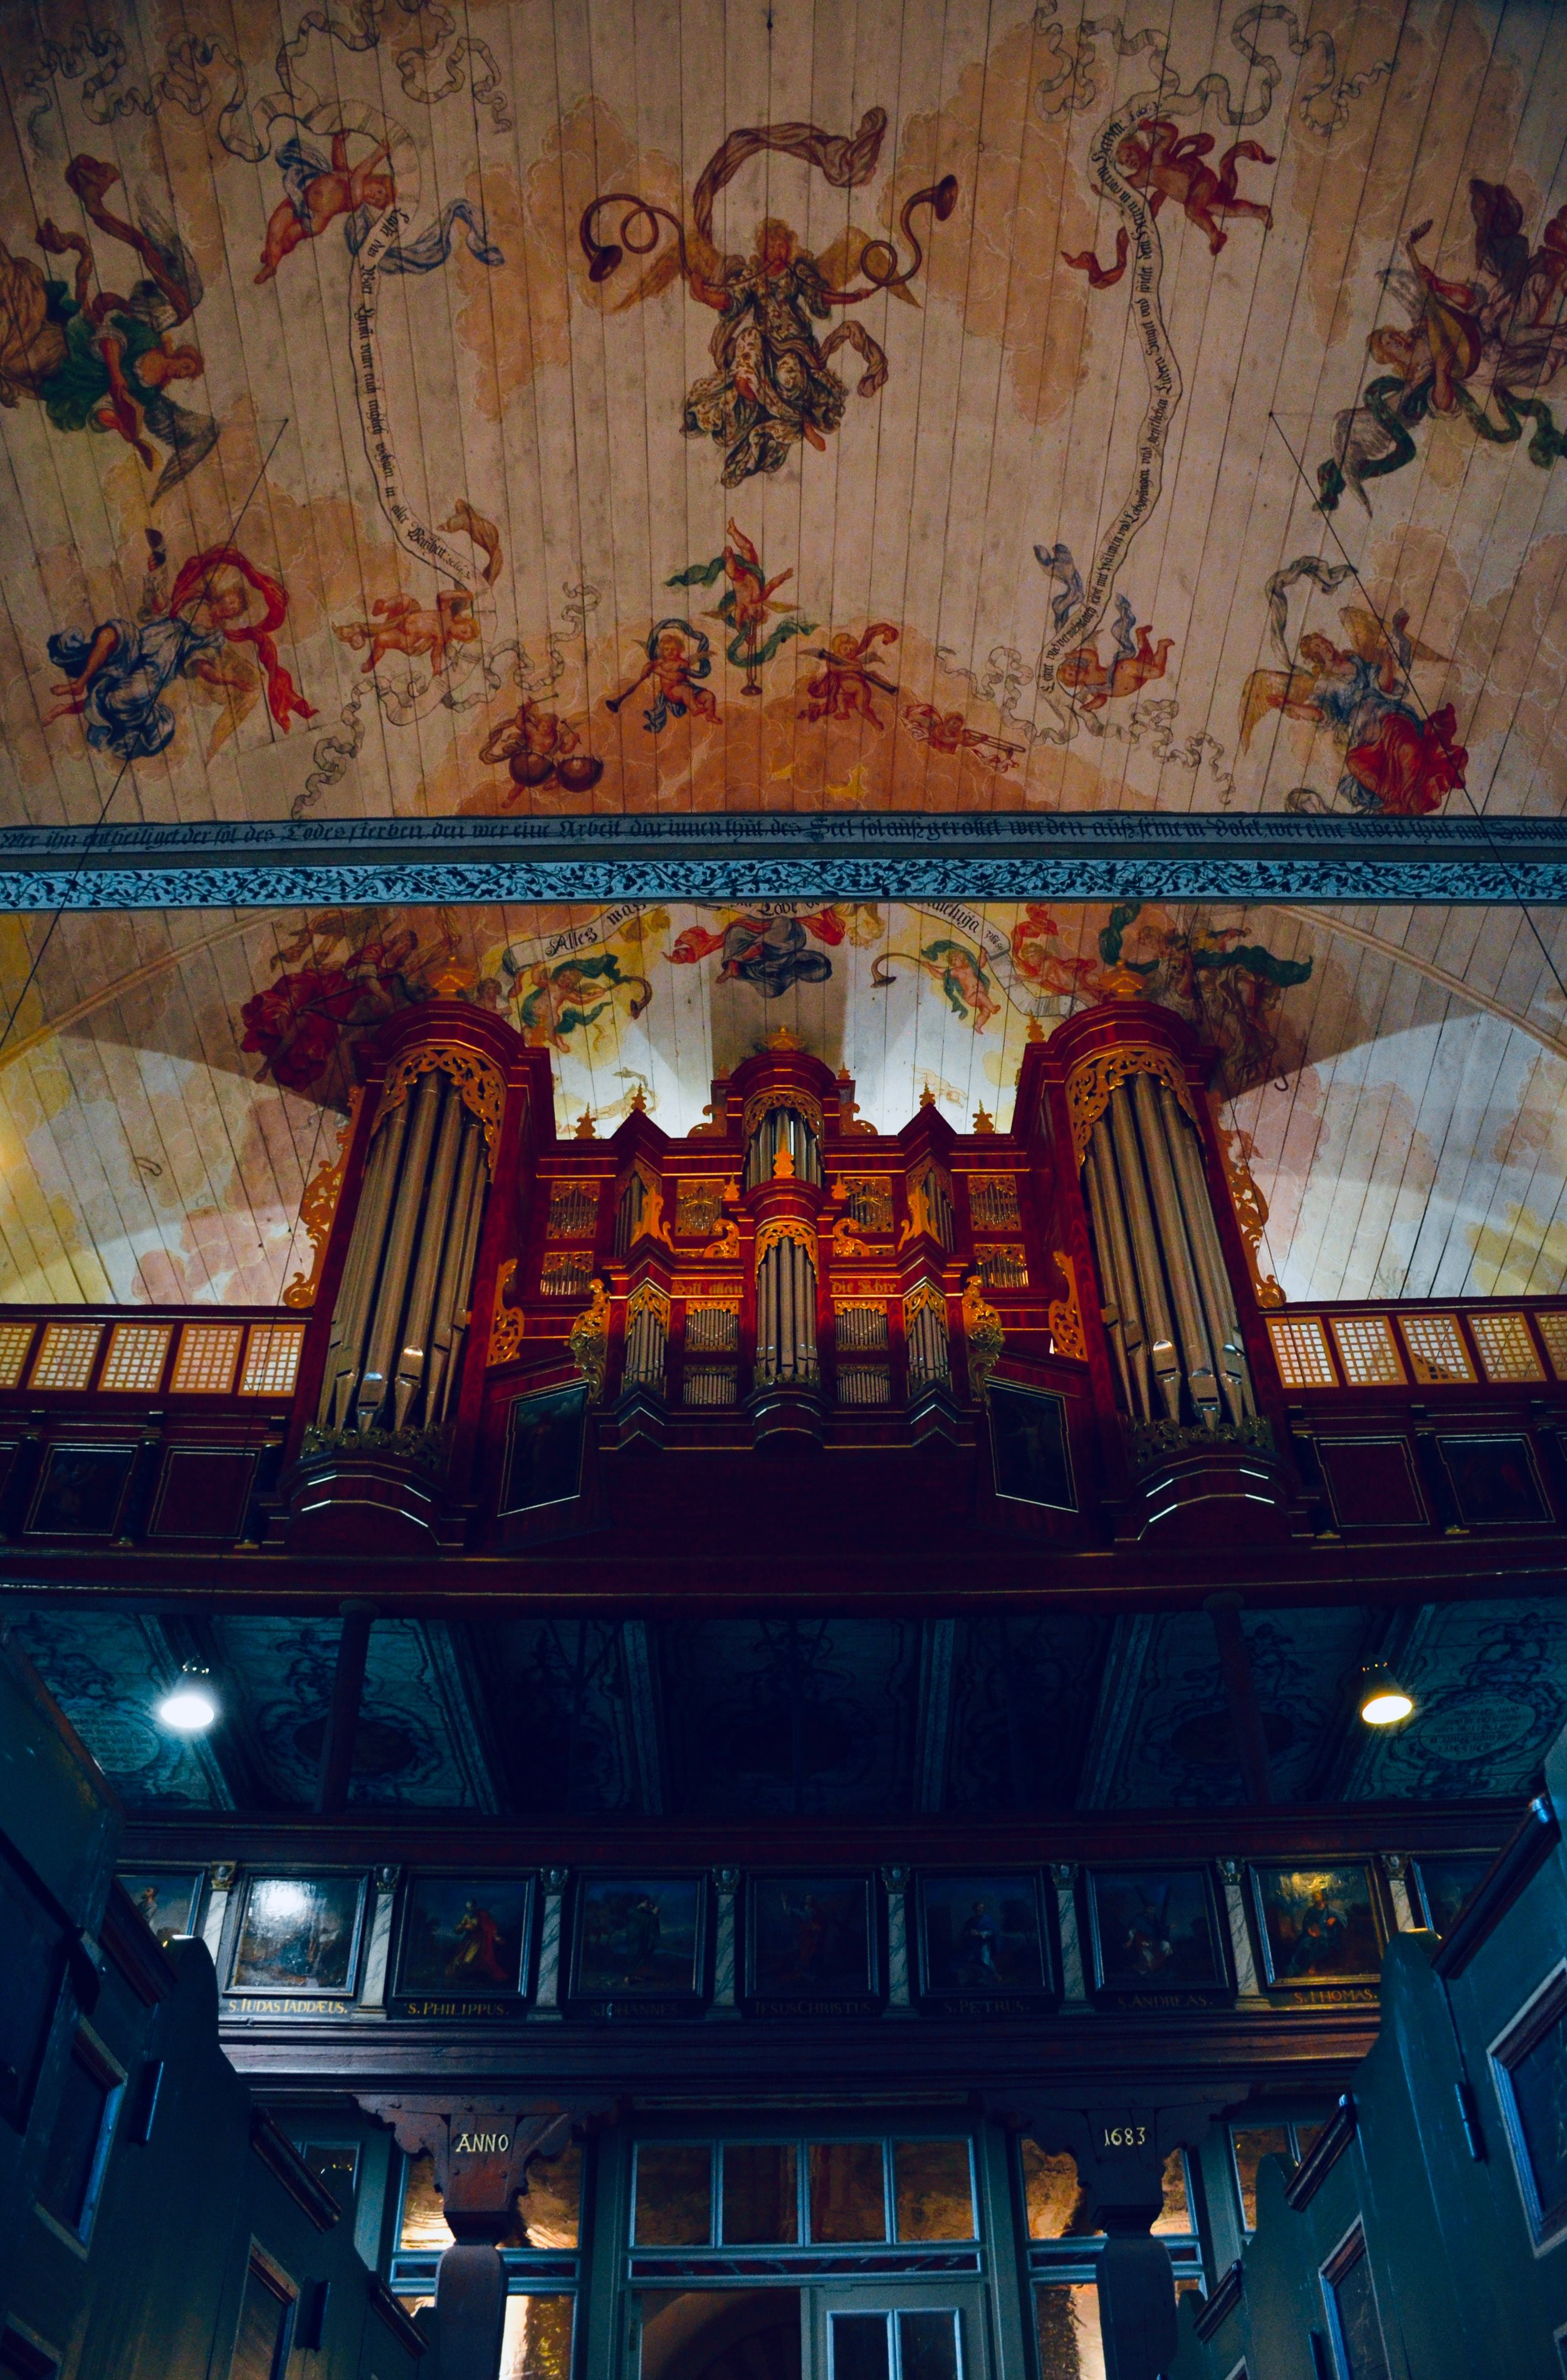 1688 Schnitger Organ, St. Pankratius, Neuenfelde, Germany. Boston Organ Studio.